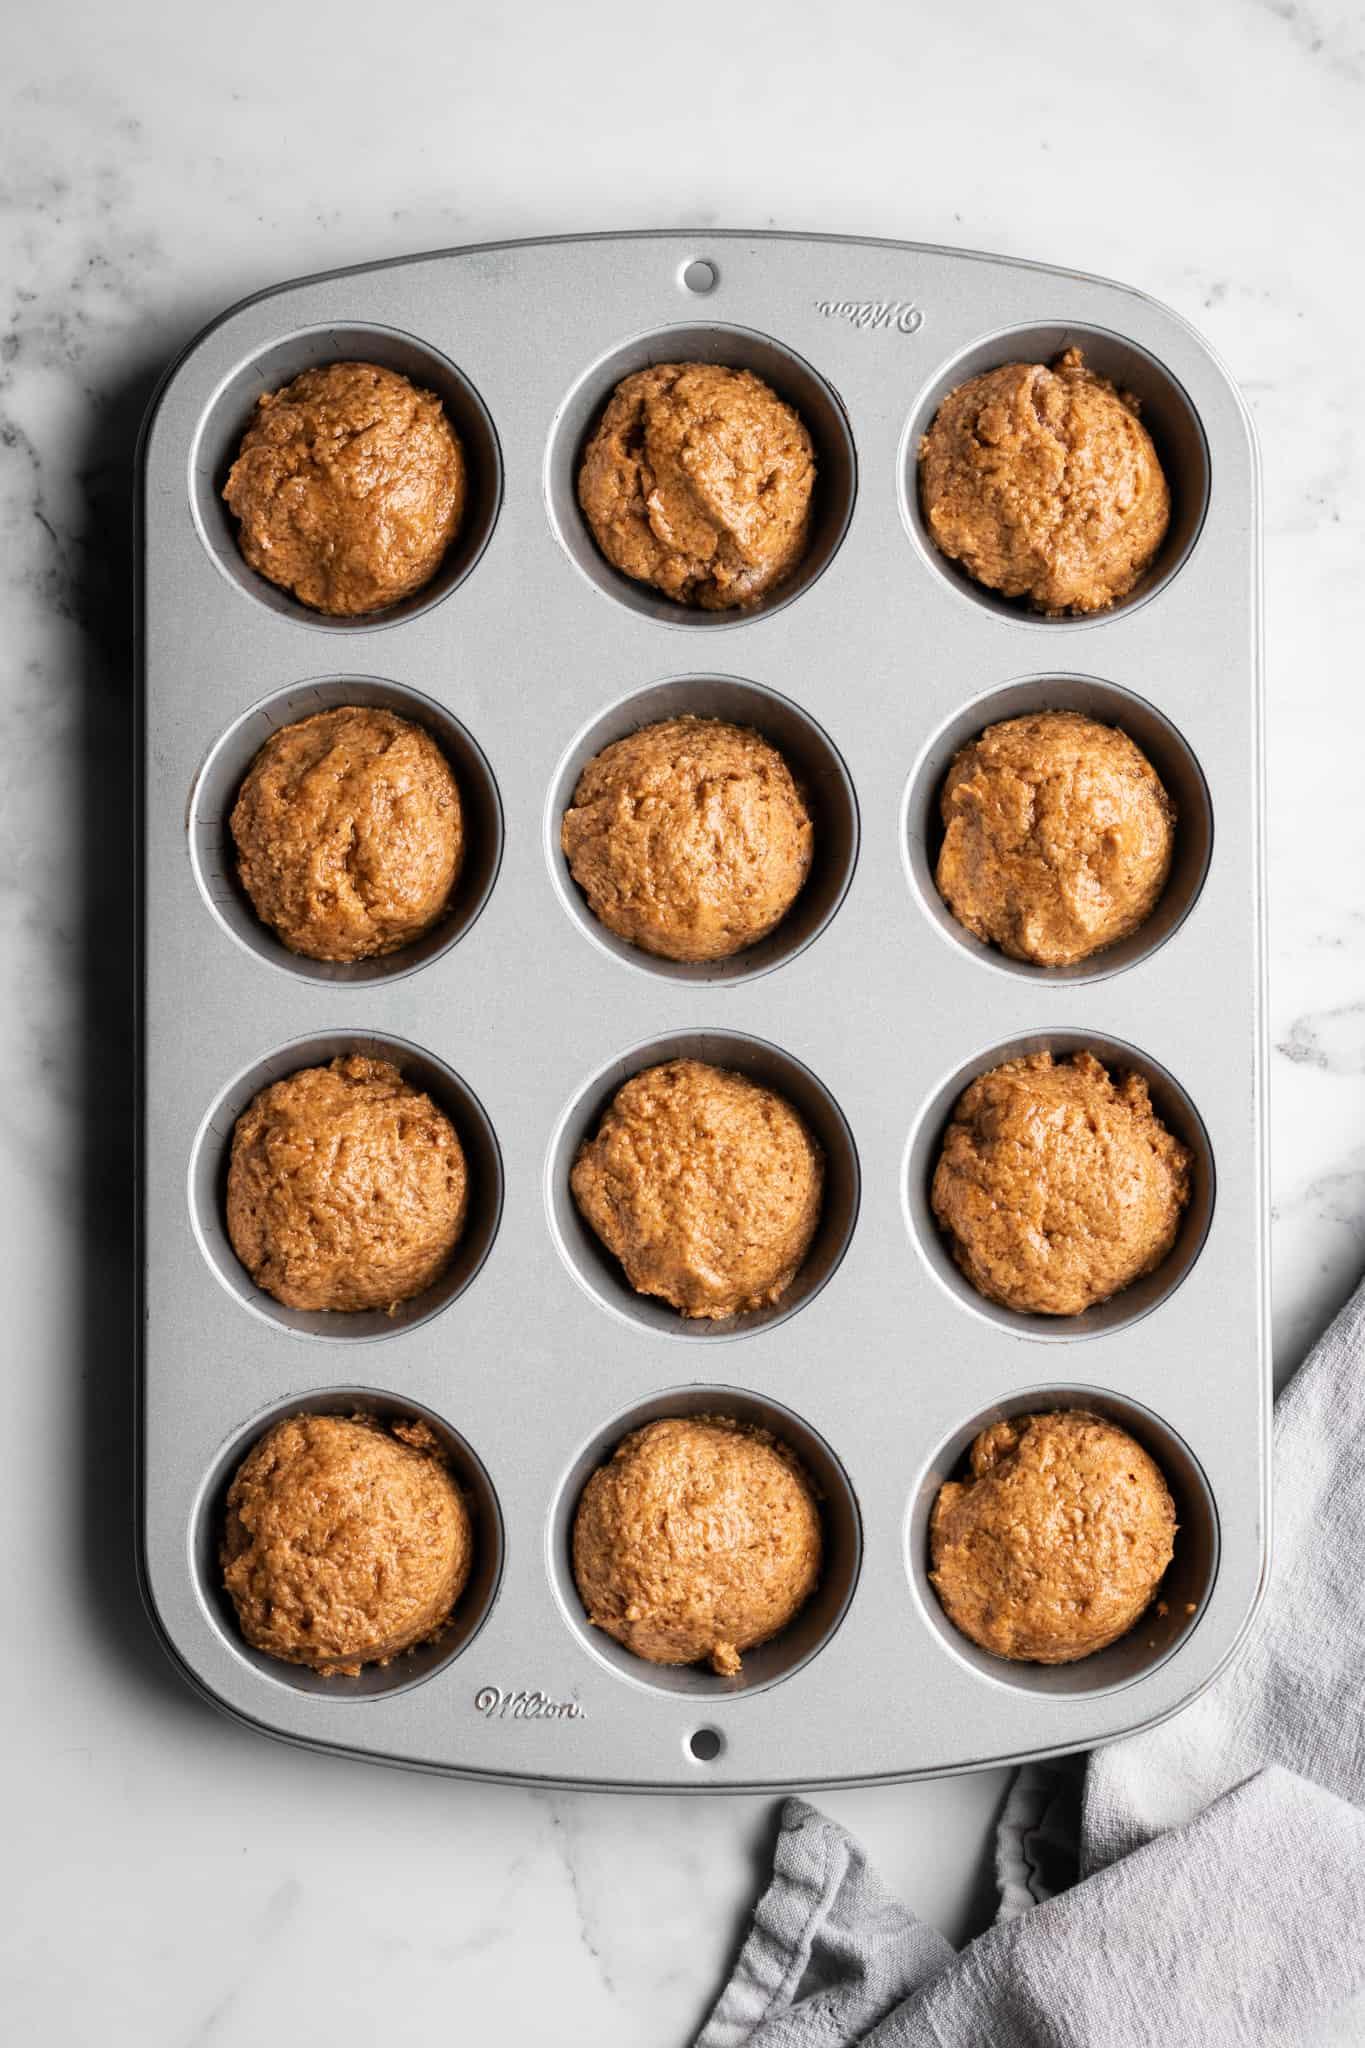 wet muffin mixture in muffin tins